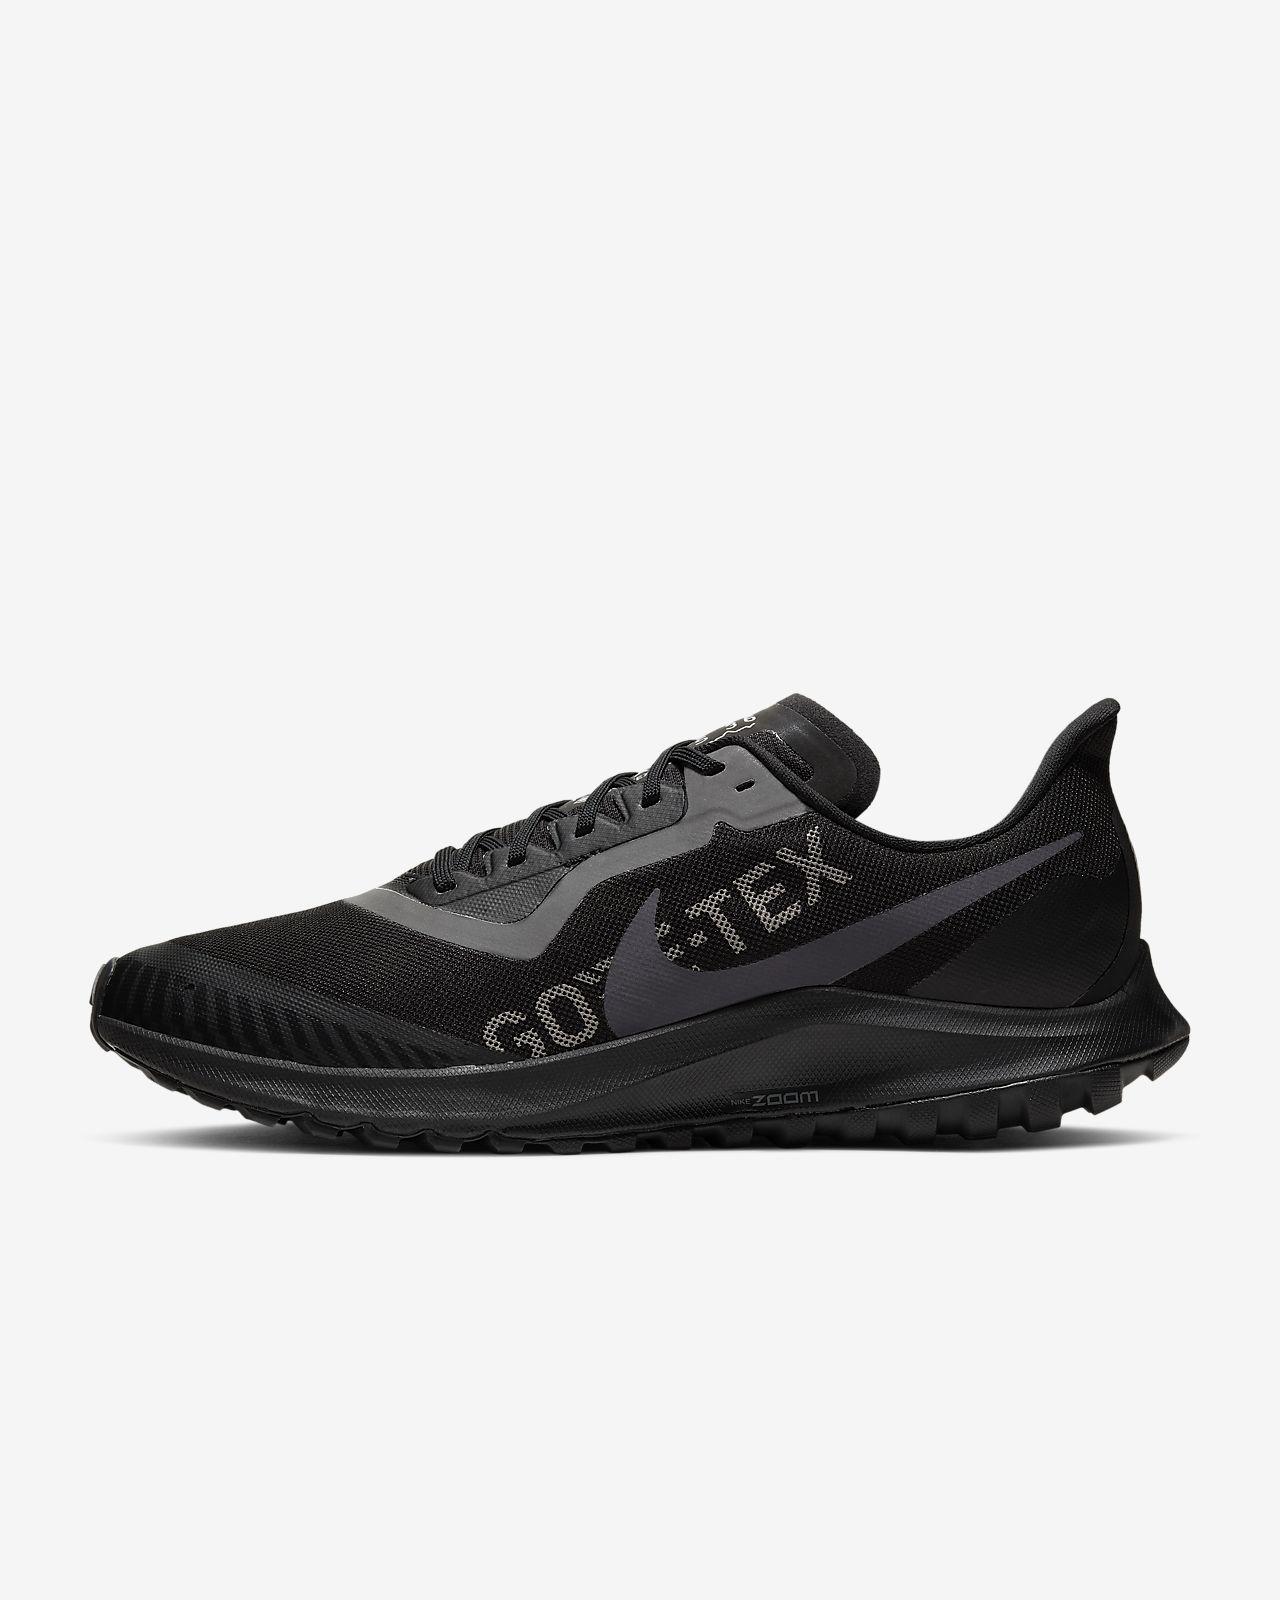 Nike Zoom Pegasus 36 Trail GORE-TEX Trailrunningschoen voor heren